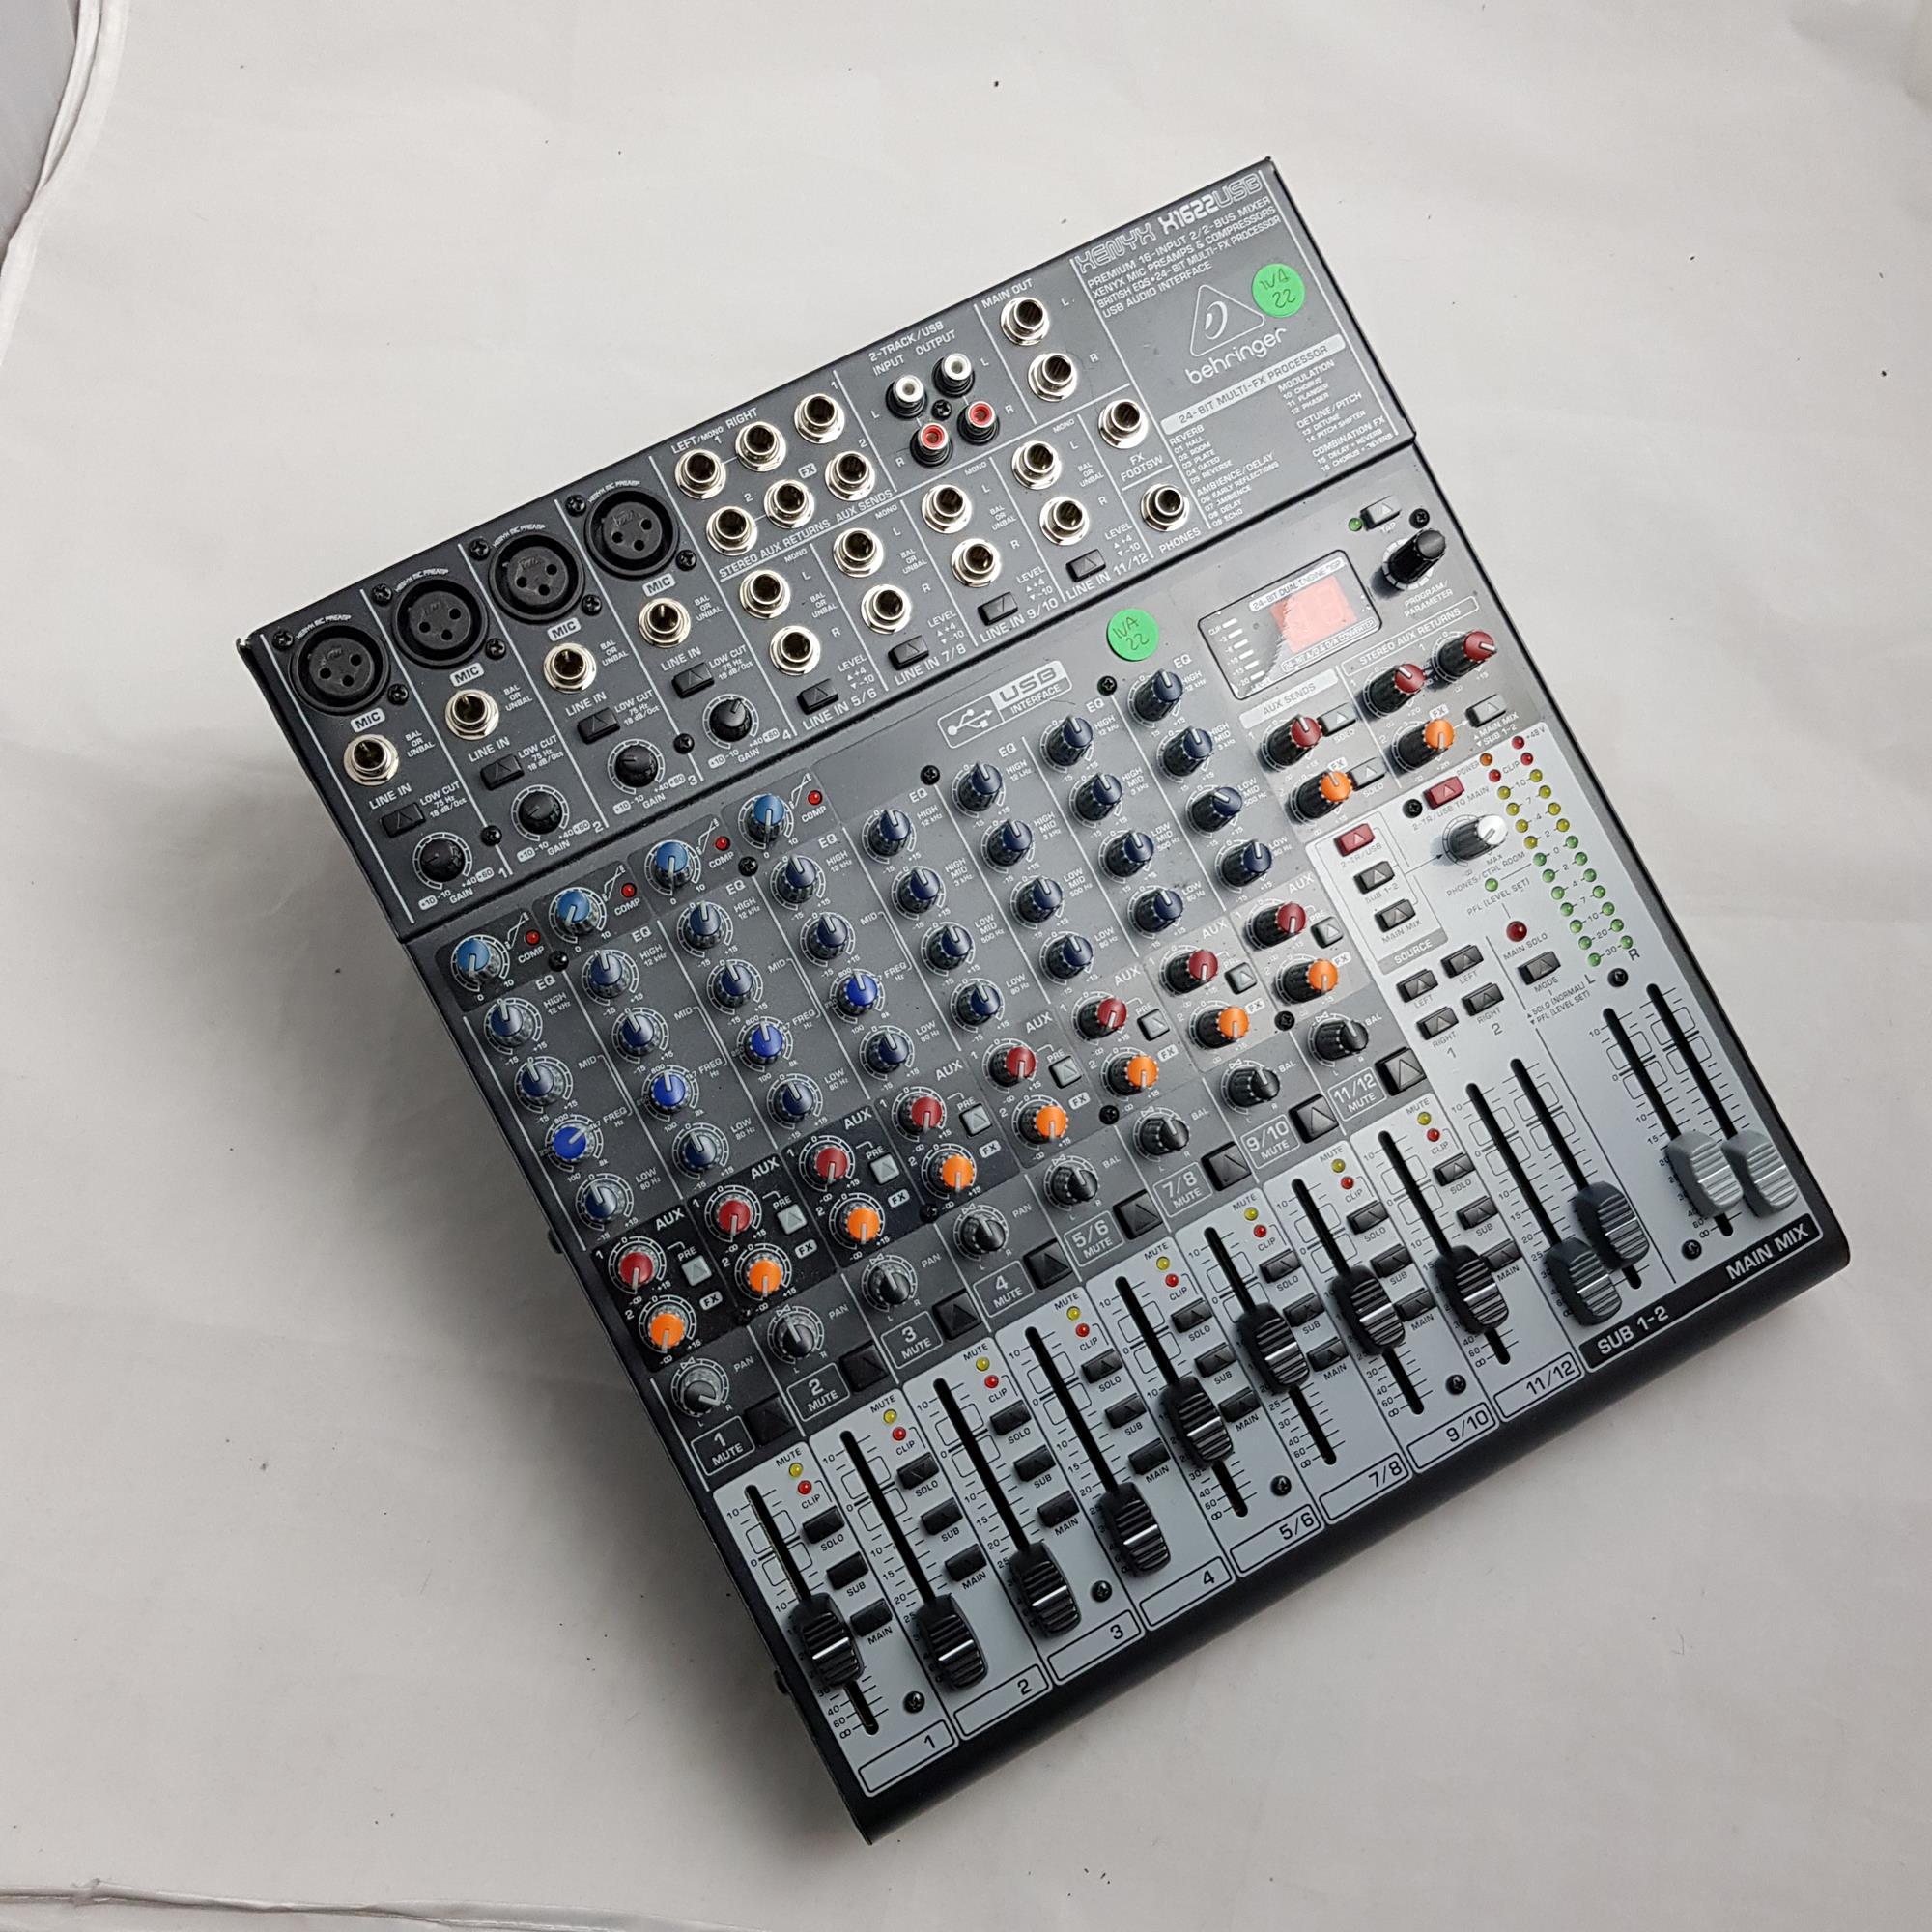 BEHRINGER-XENYX-X1622USB-sku-1608368774104